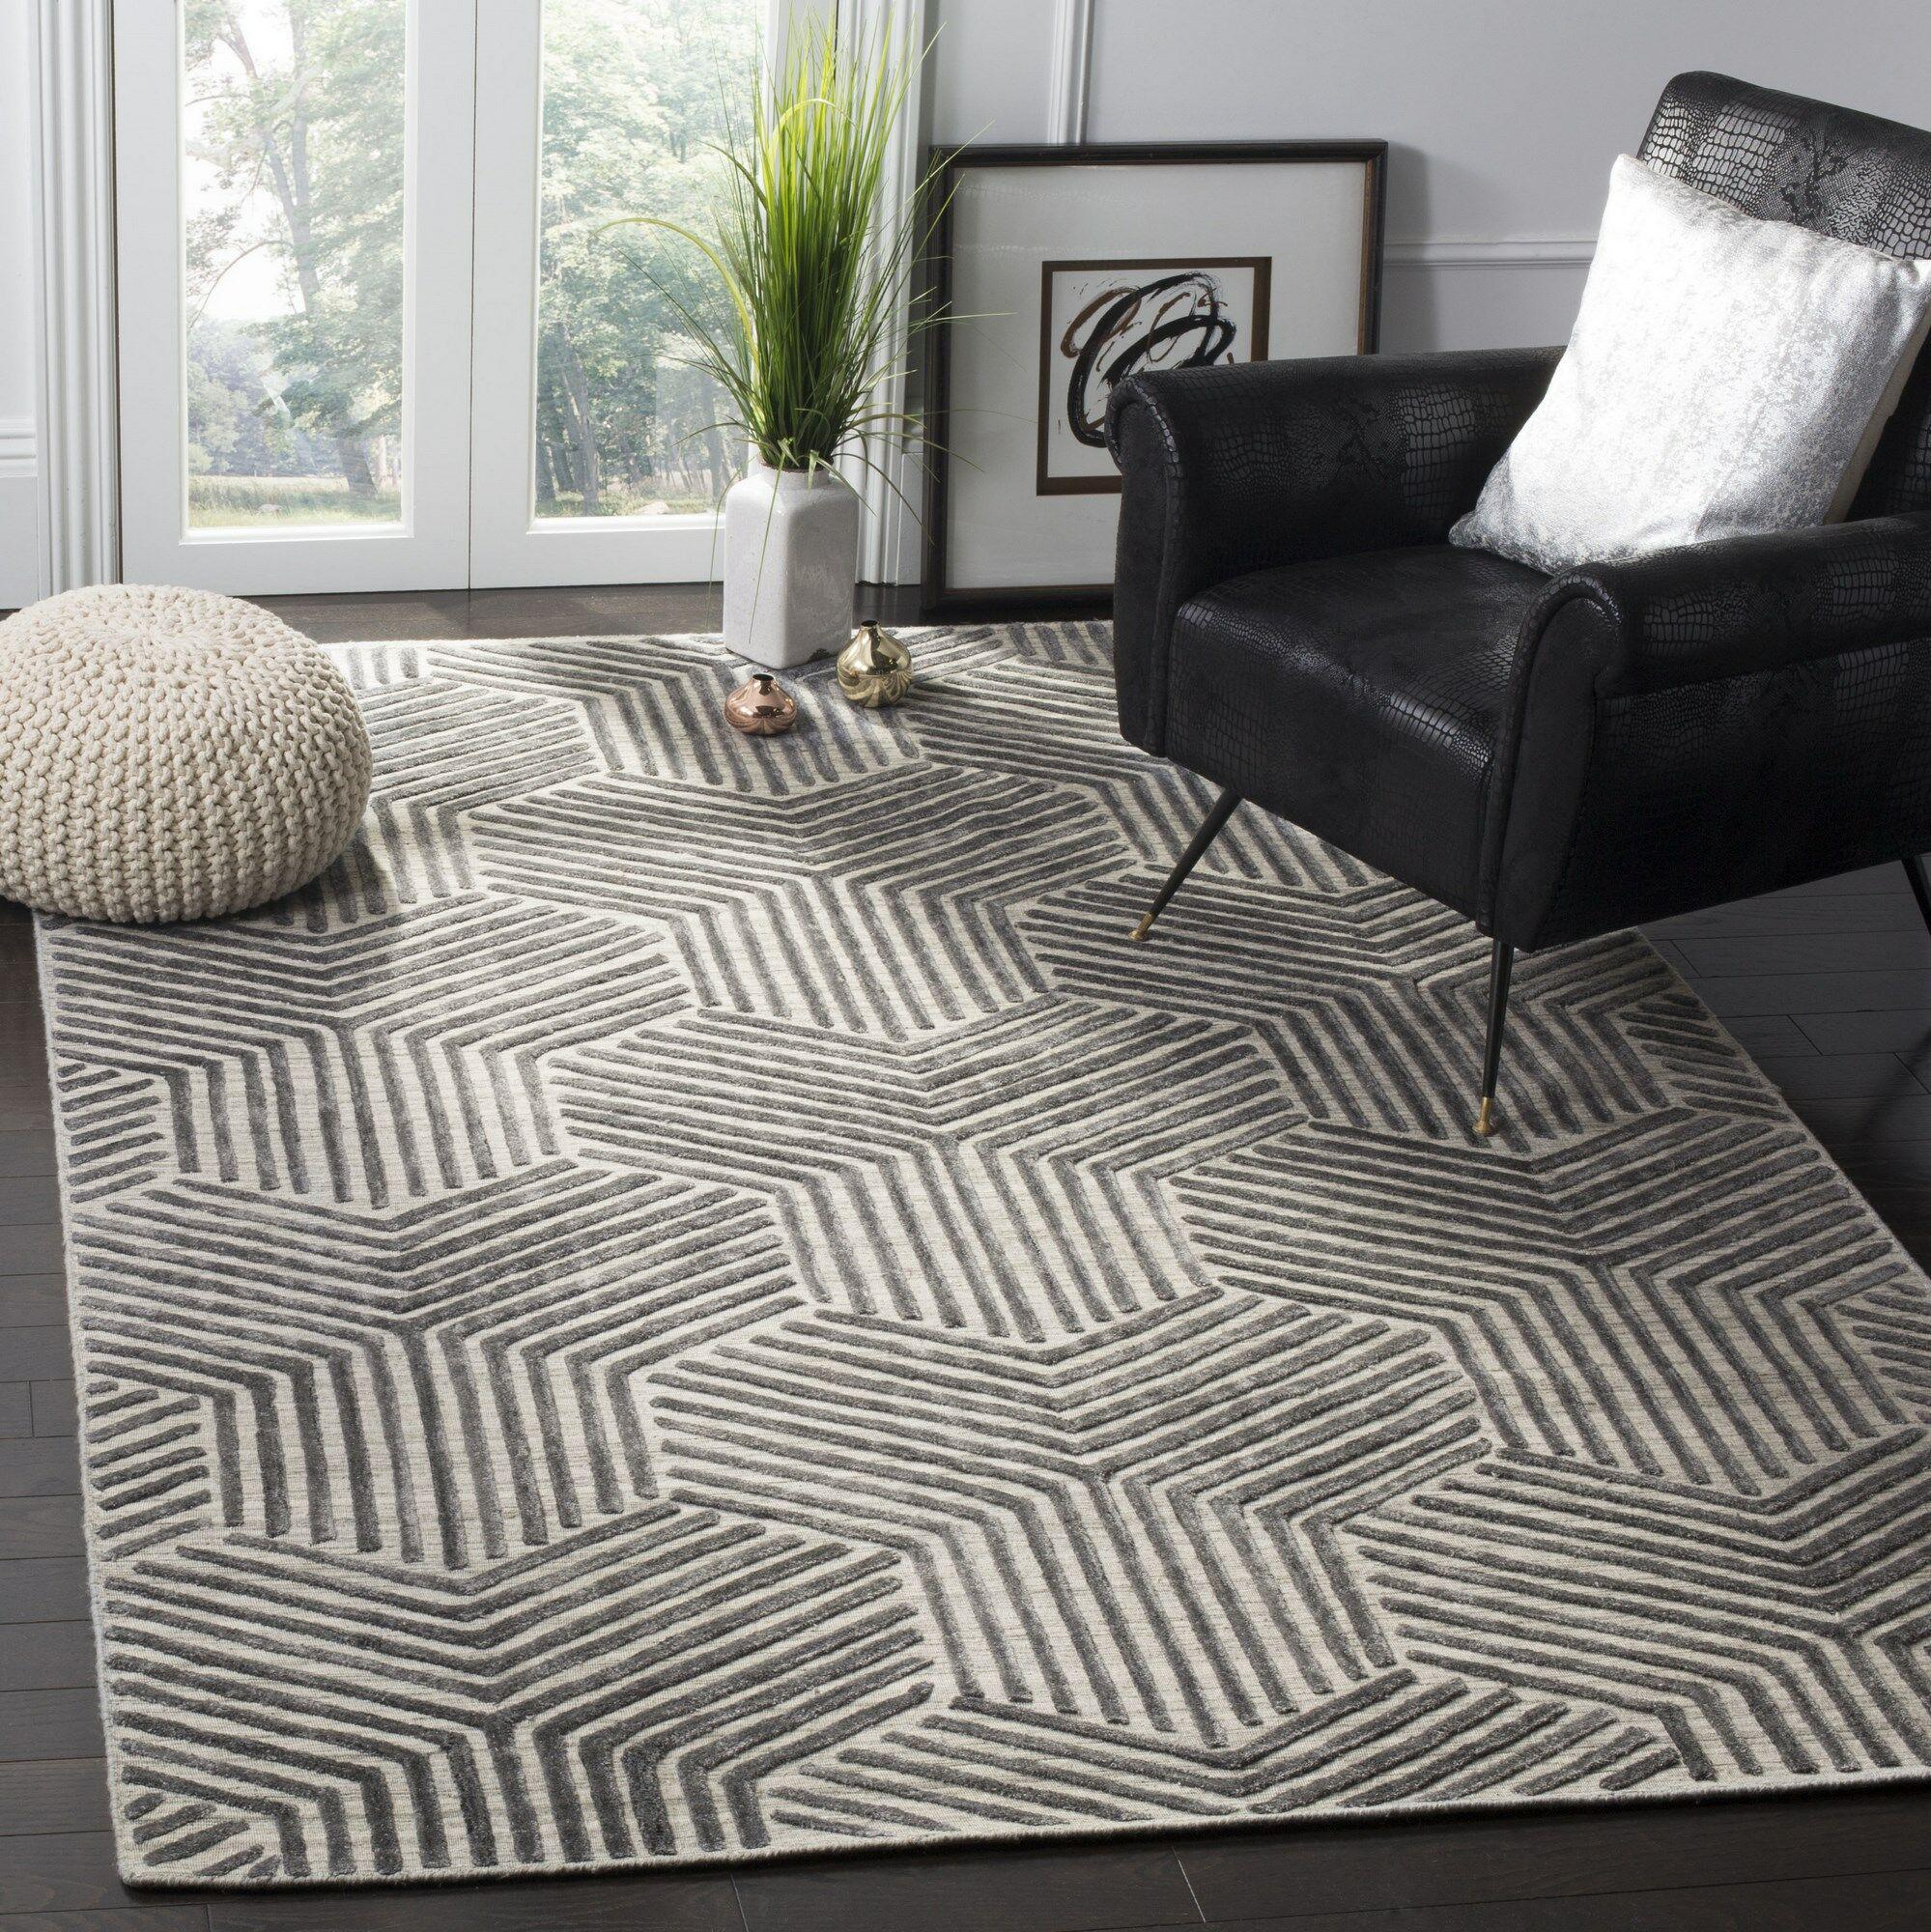 Driftwood Hand-Woven Light Gray/Charcoal Area Rug Rug Size: Rectangle 6' x 9'